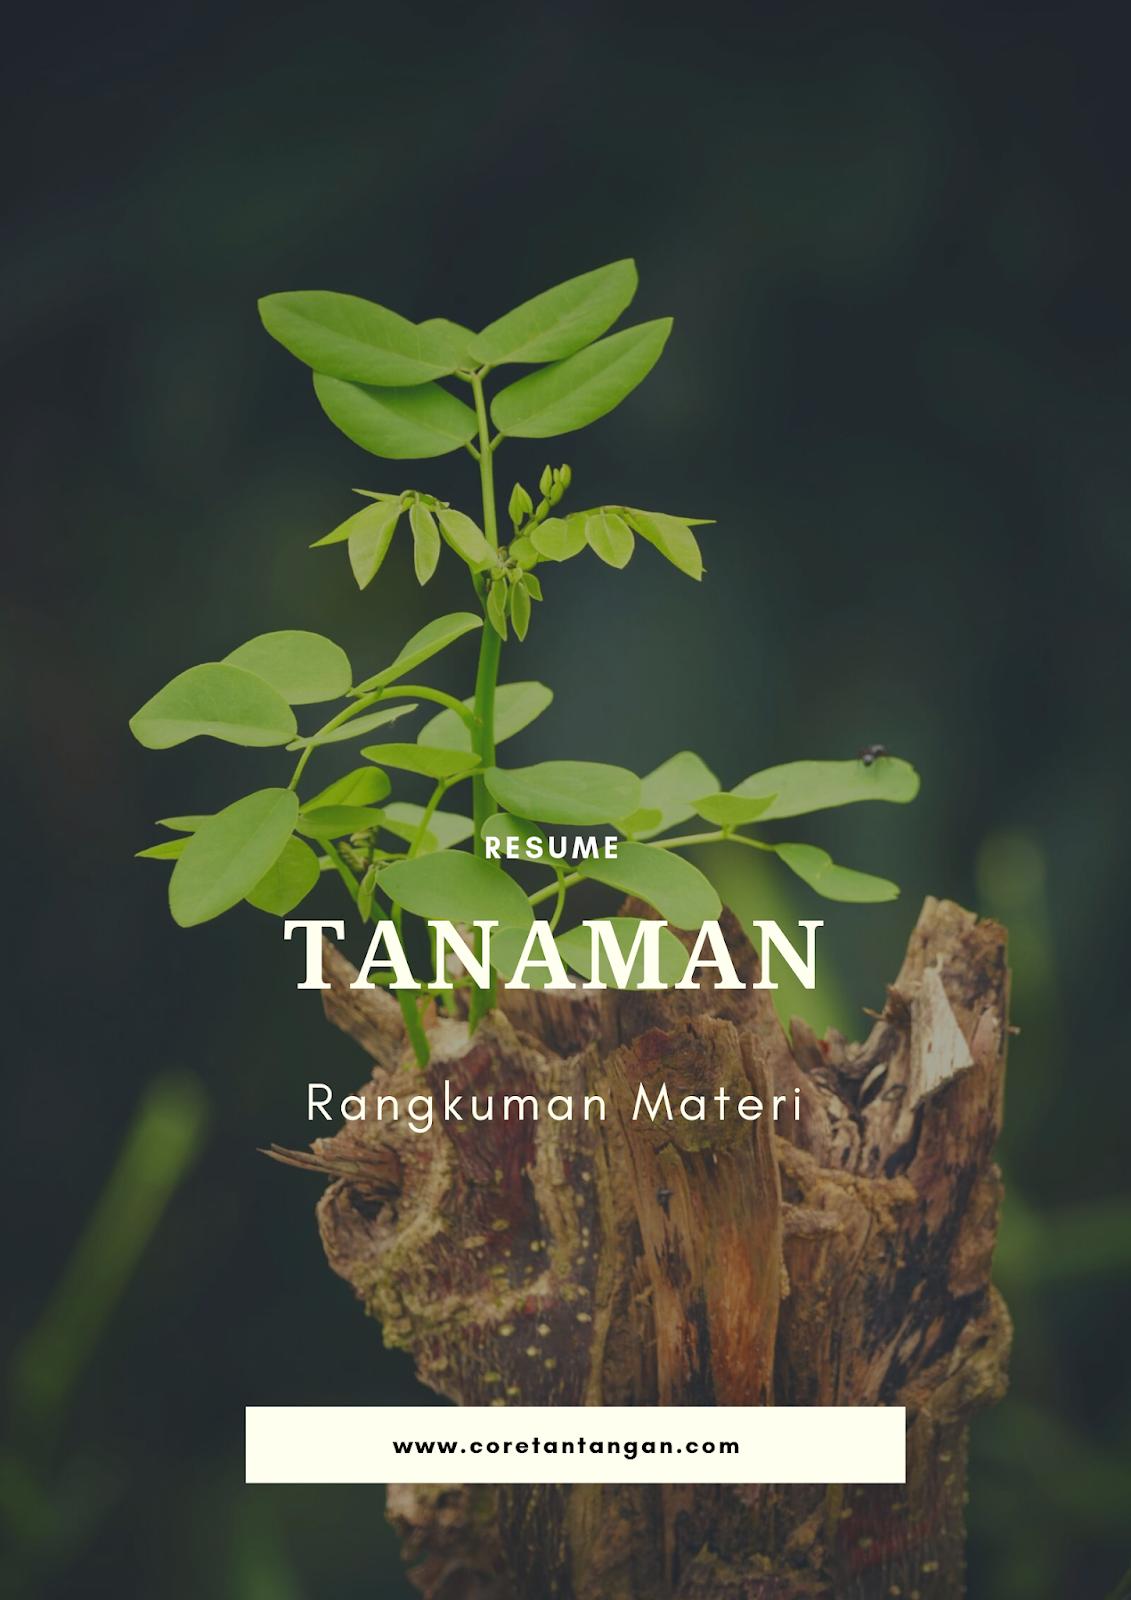 www.coretantangan.com